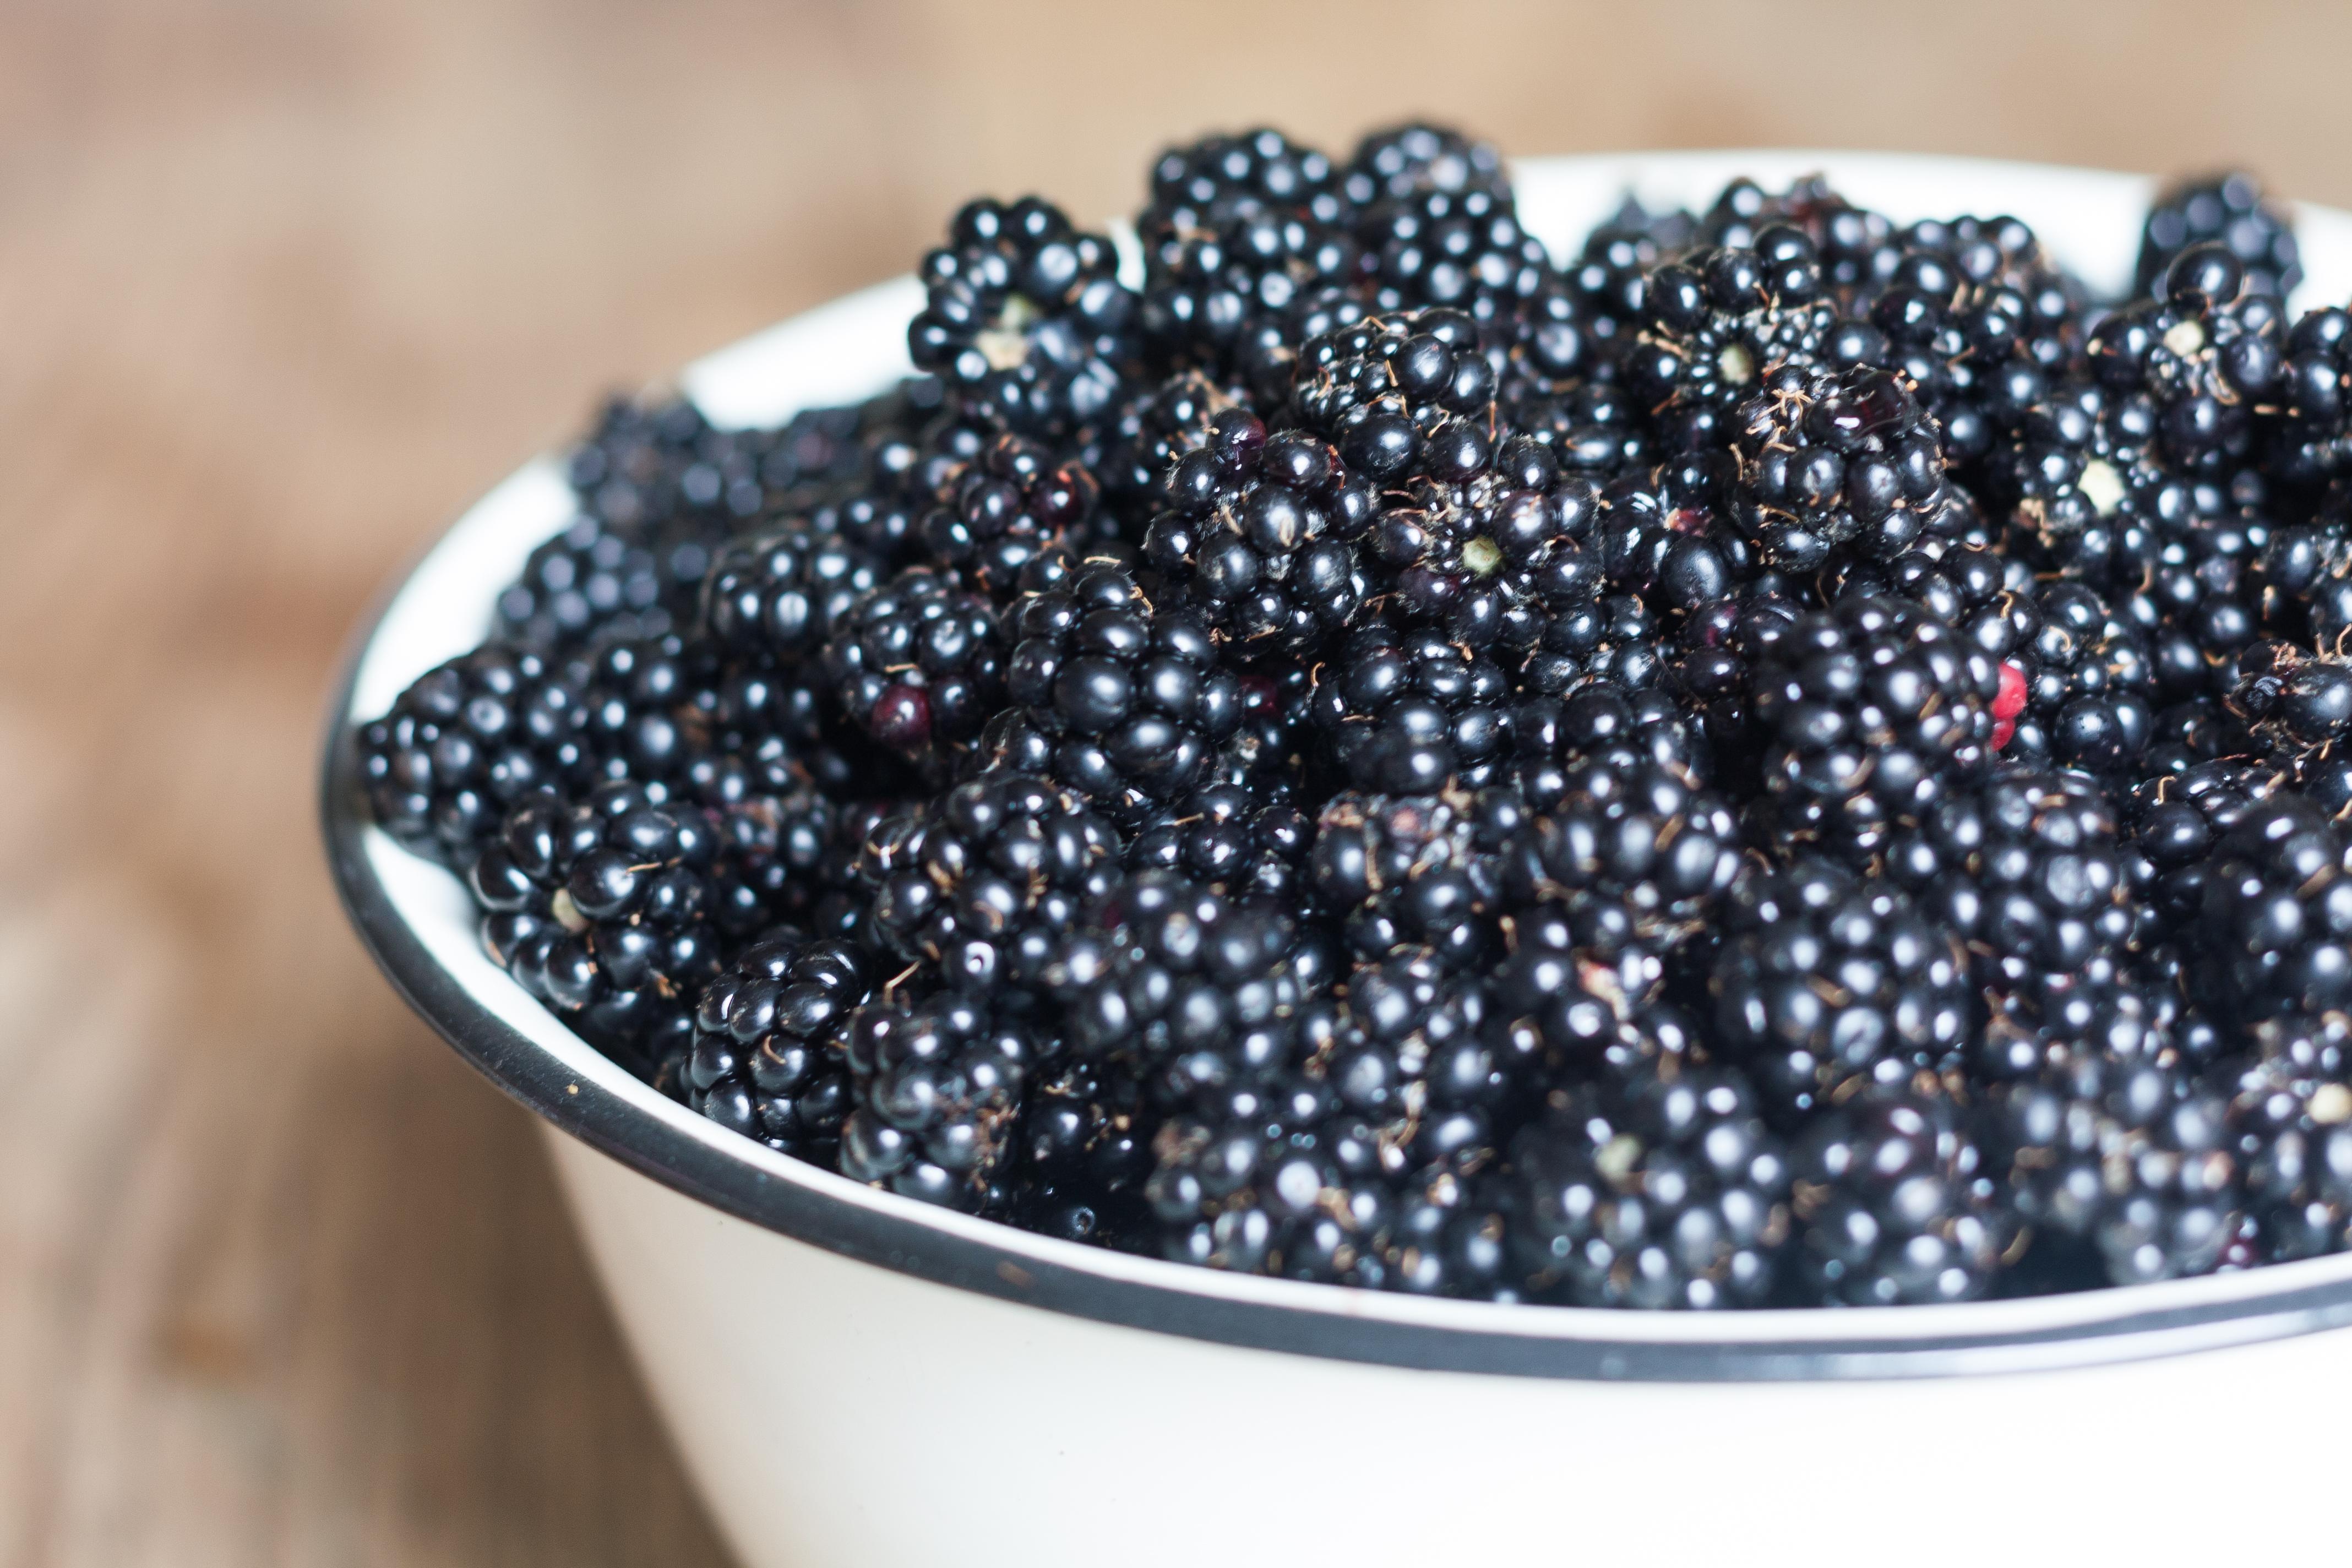 Harvested Blackberries